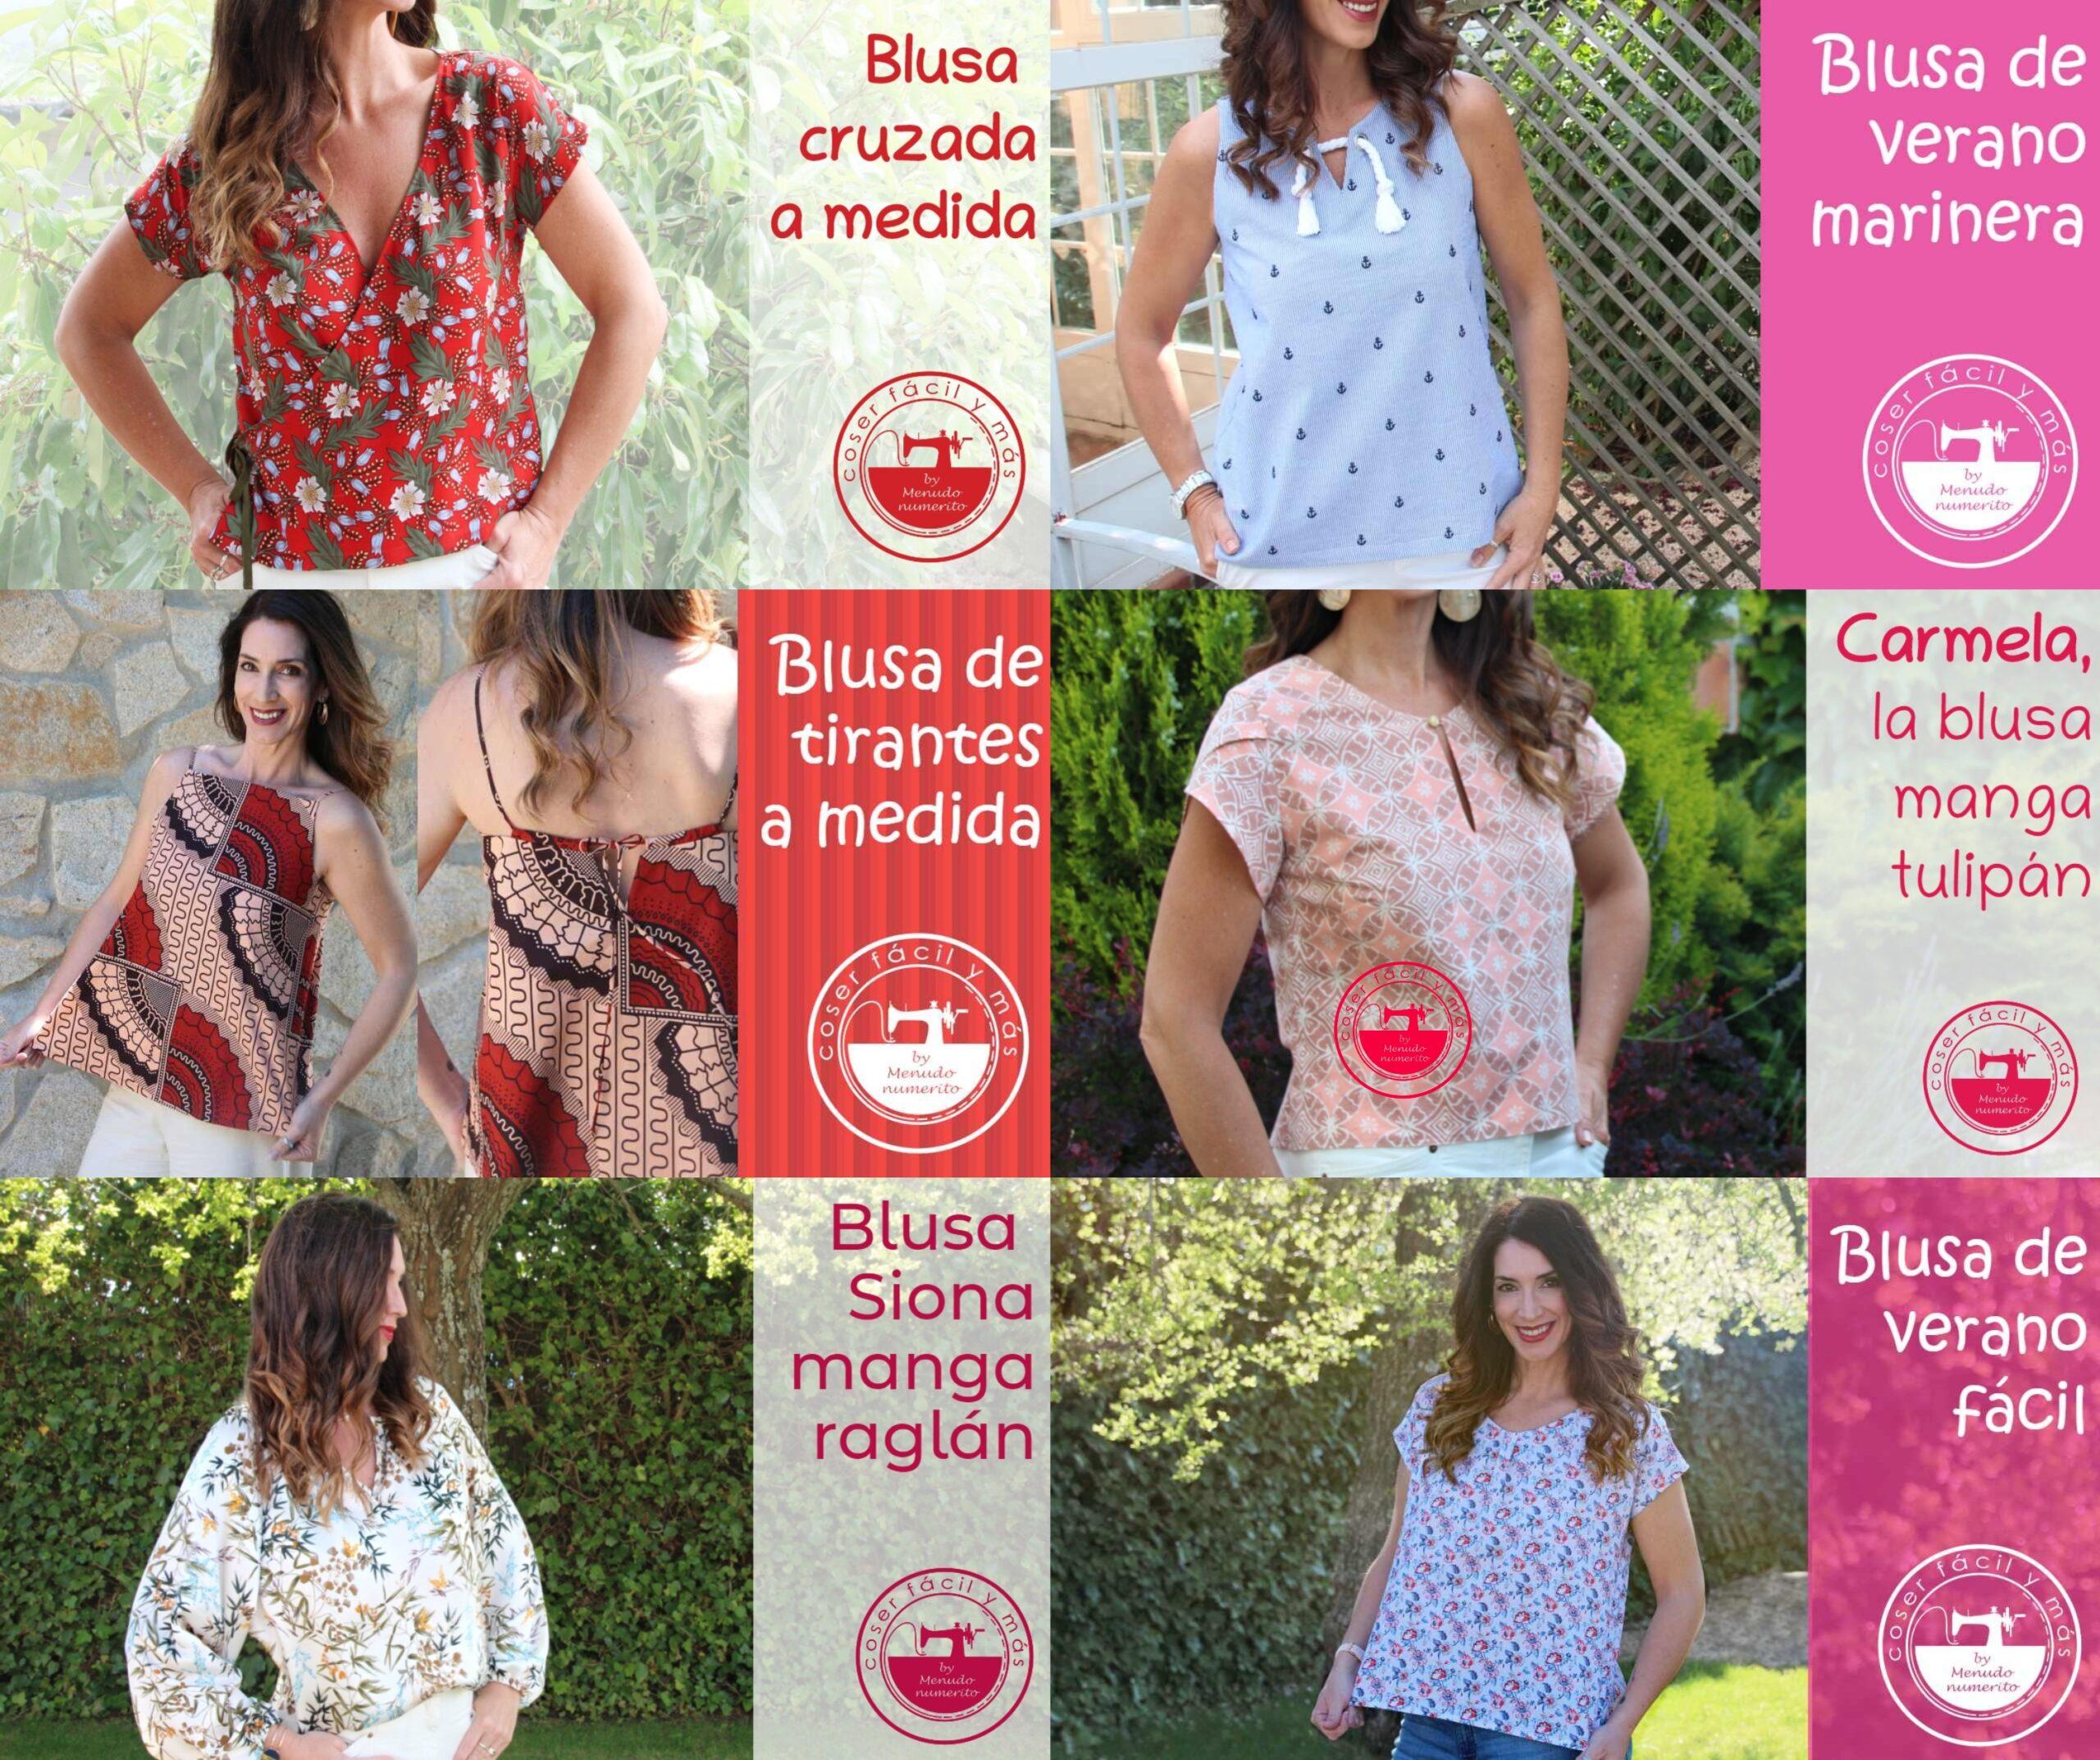 blusas fáciles menudo numerito blogs de costura